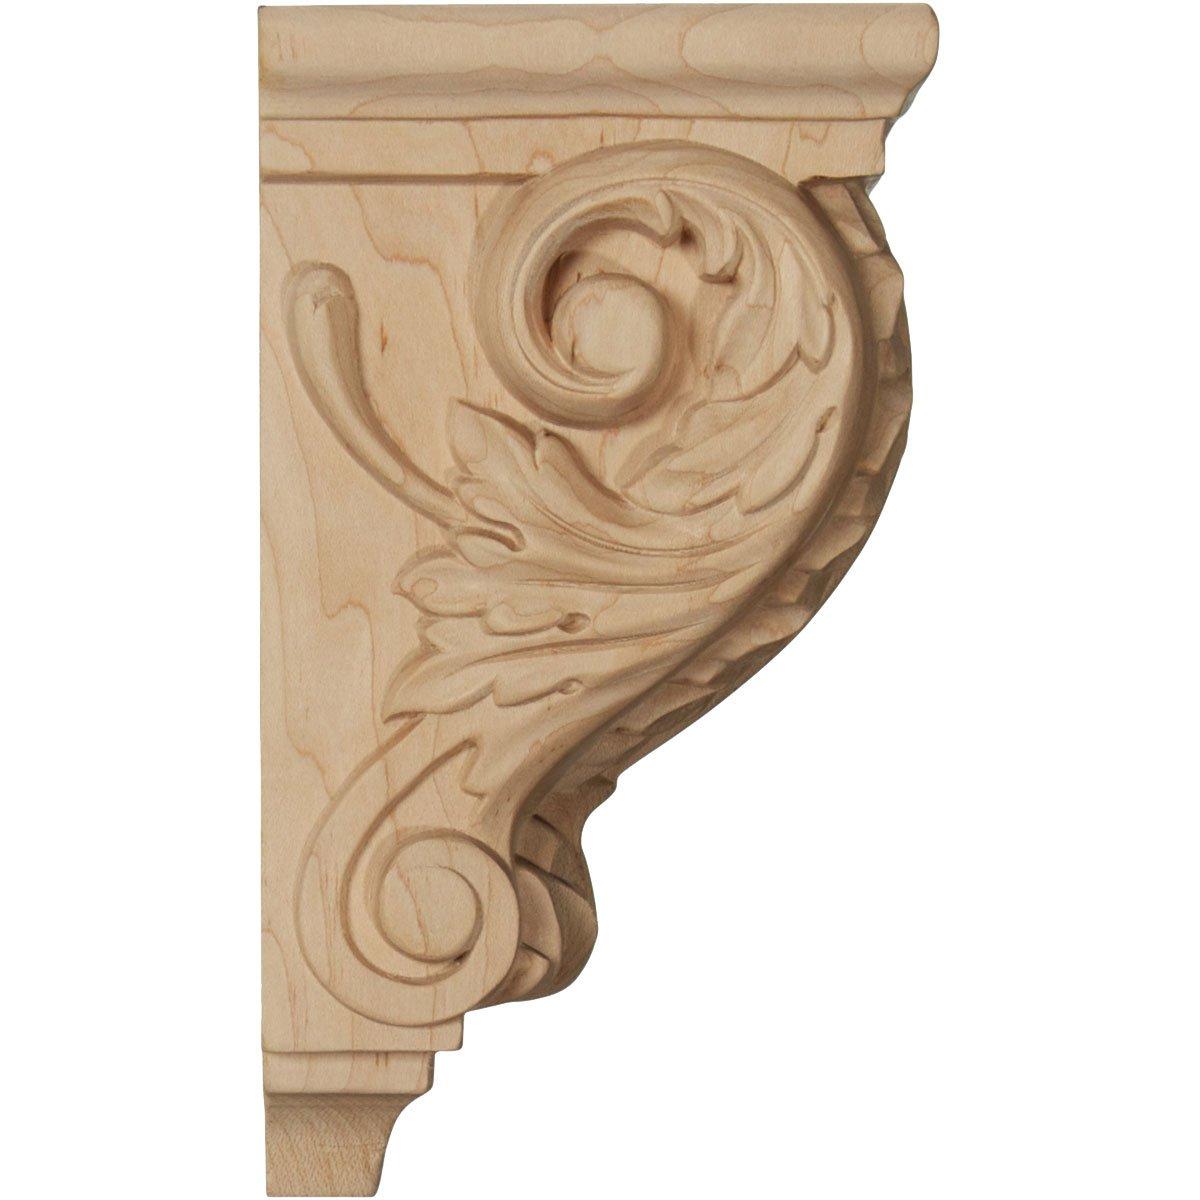 Ekena CORW03X04X07ACMA 3 1//2 W x 4 D x 7 H Small Acanthus Wood Corbel Maple